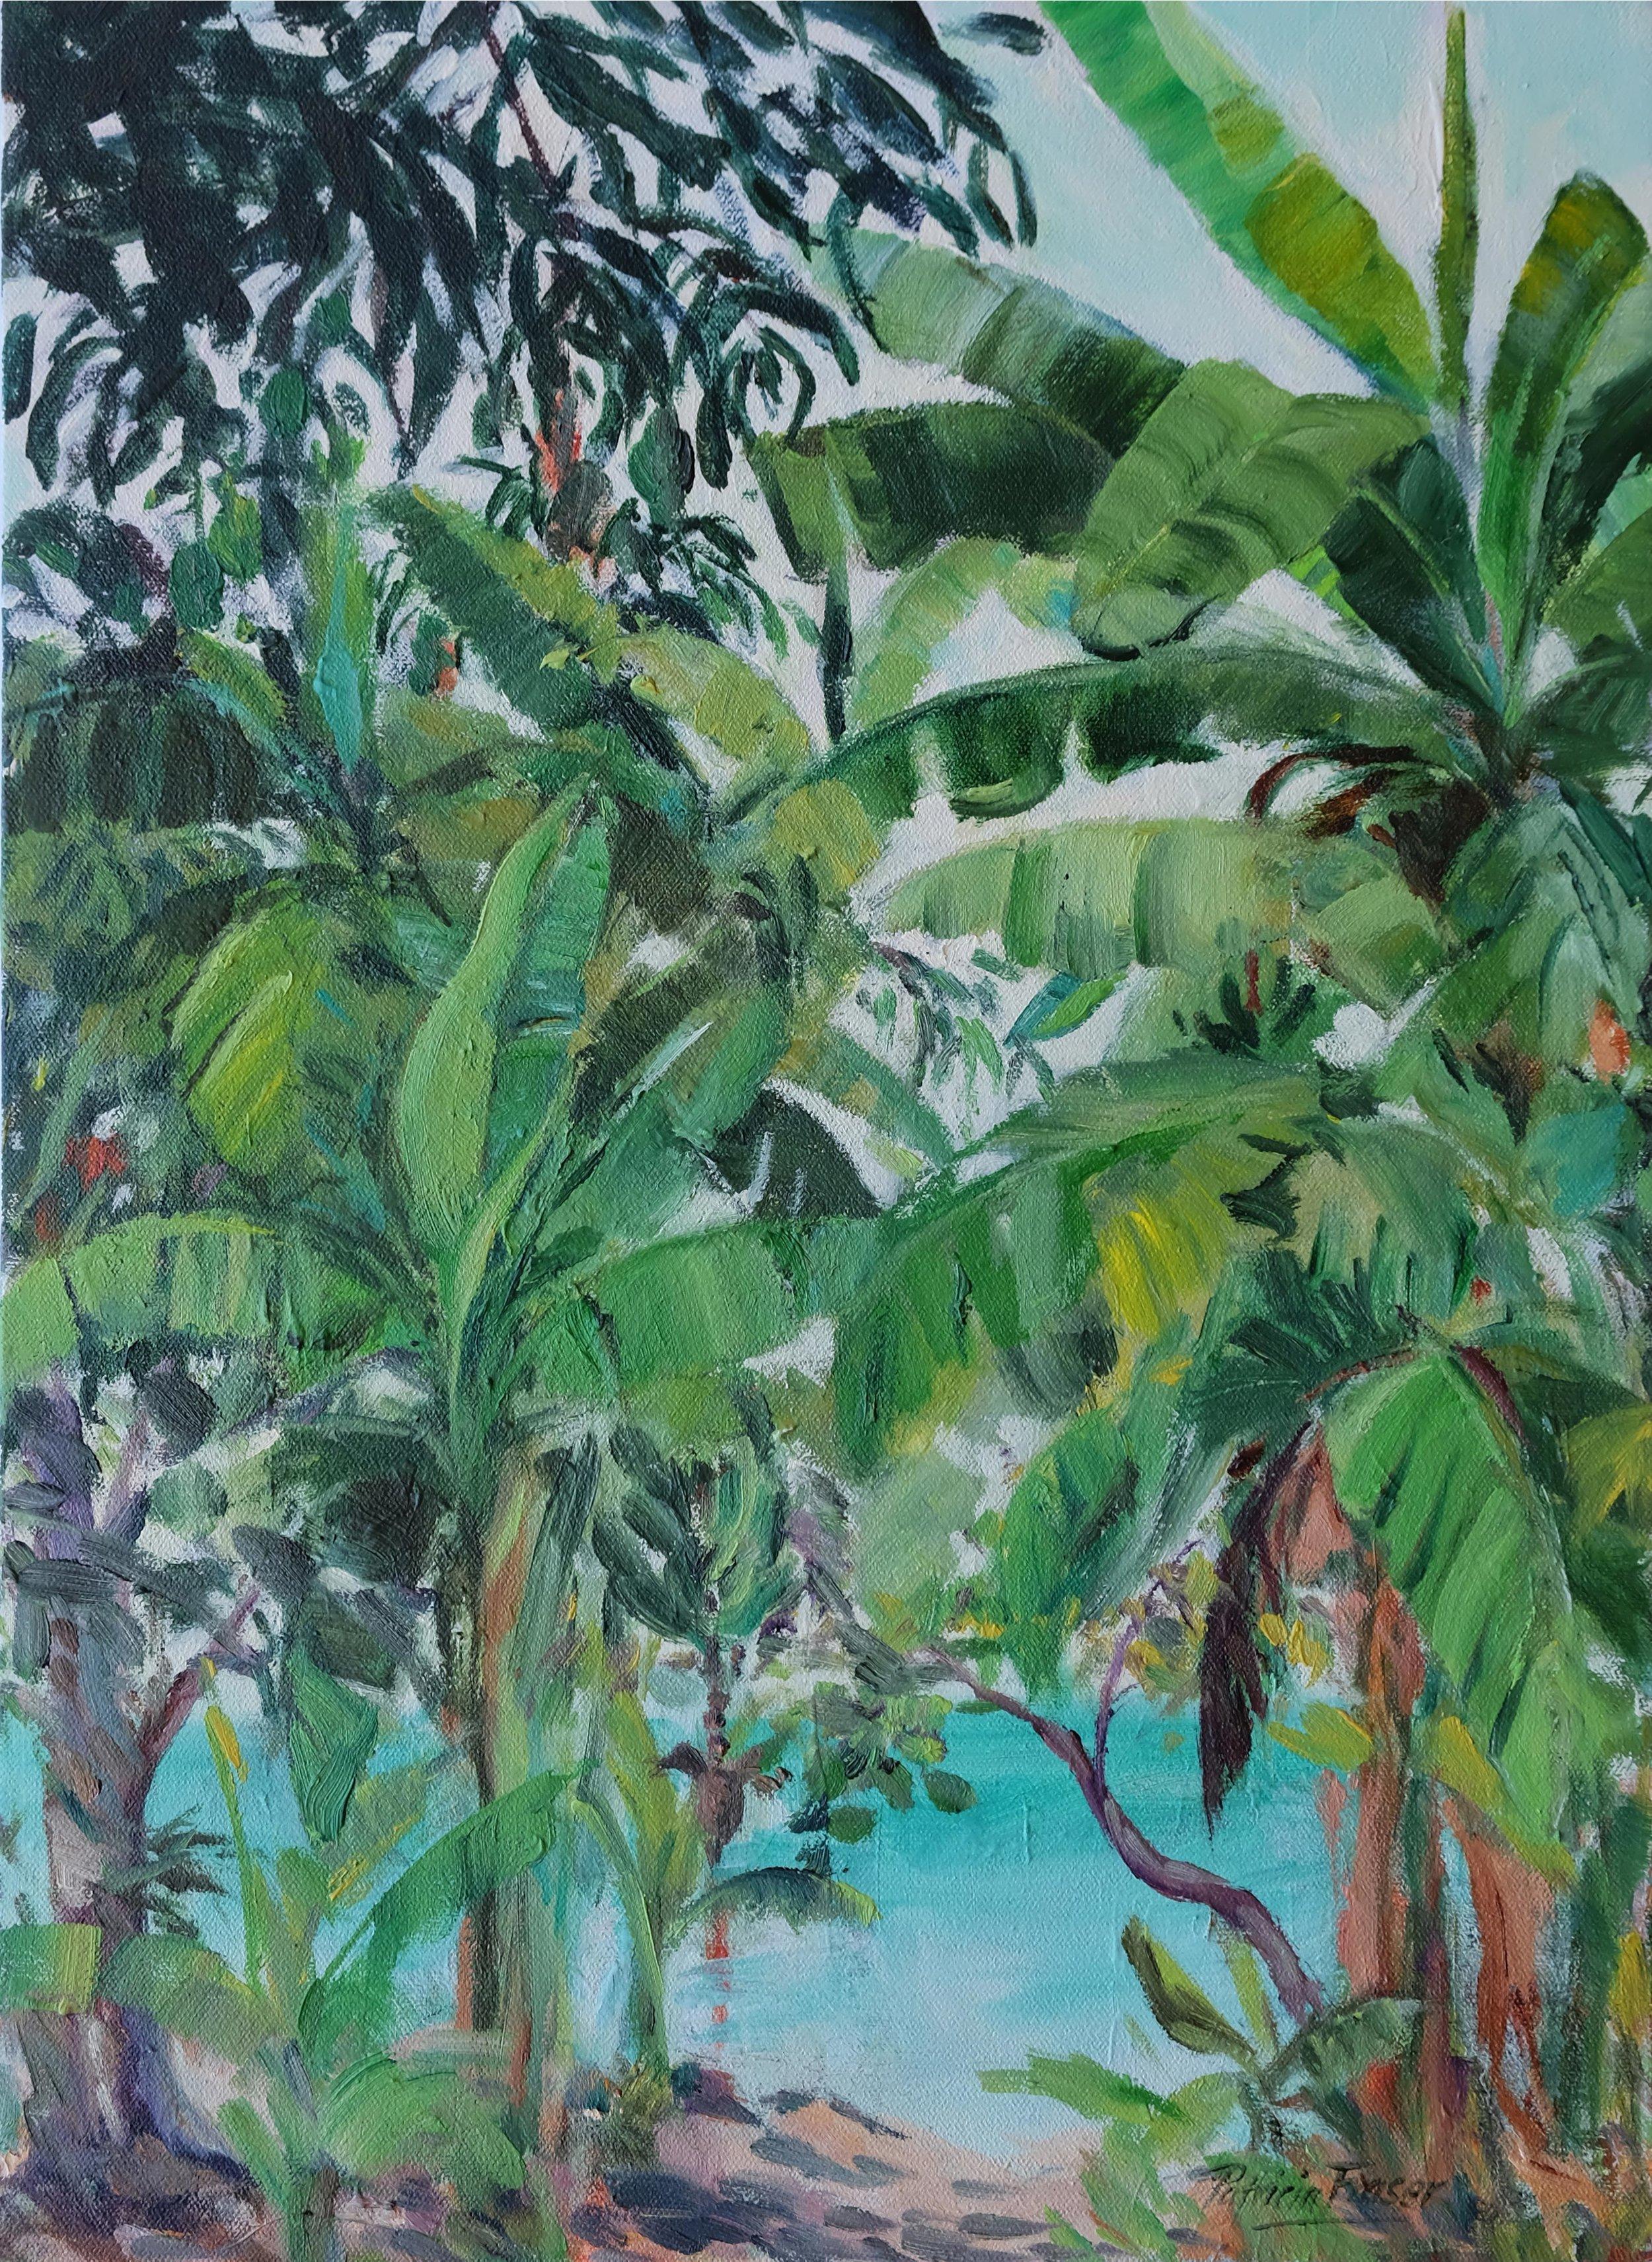 BANANAS AND SEA  54 x 40cm Oil on Canvas R 8 400